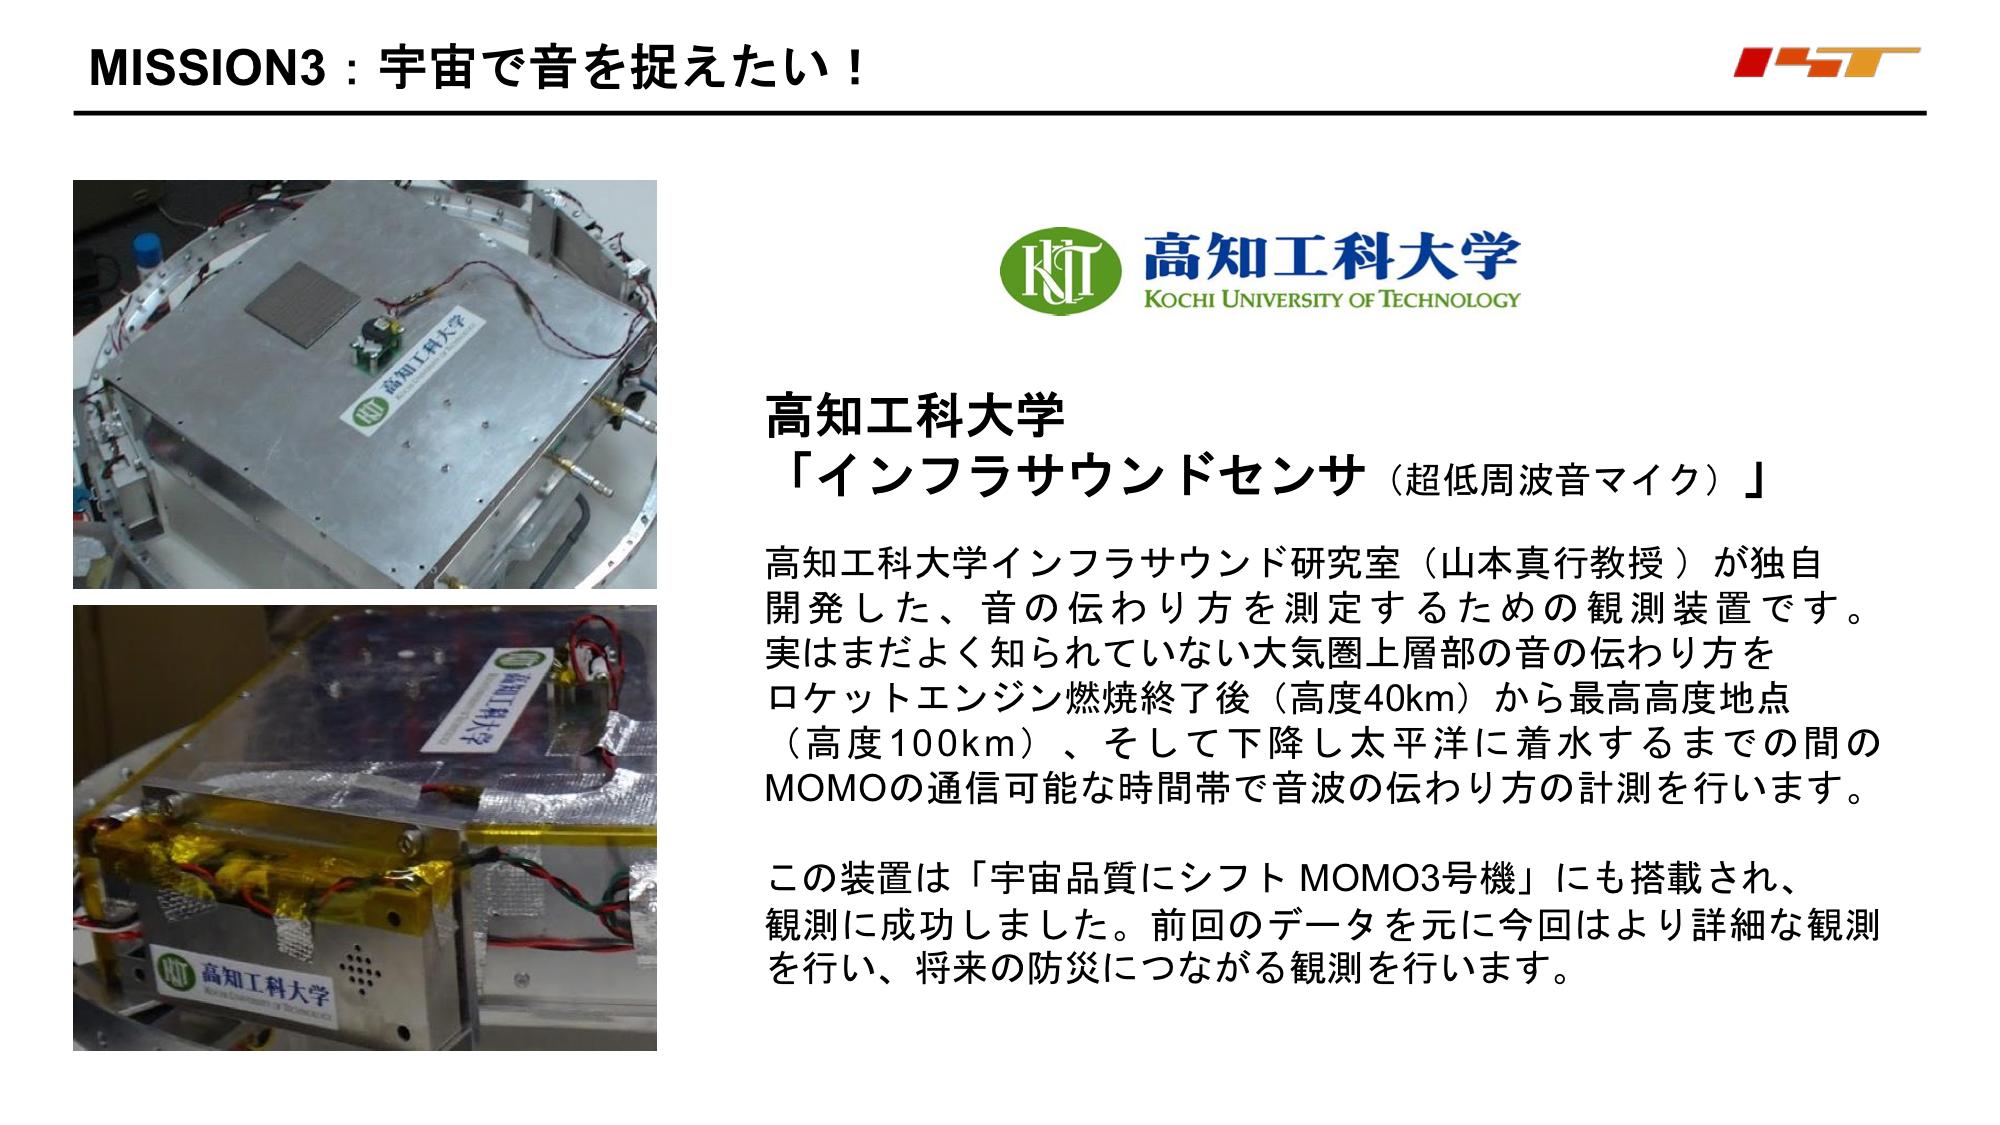 f:id:Imamura:20190628161256p:plain